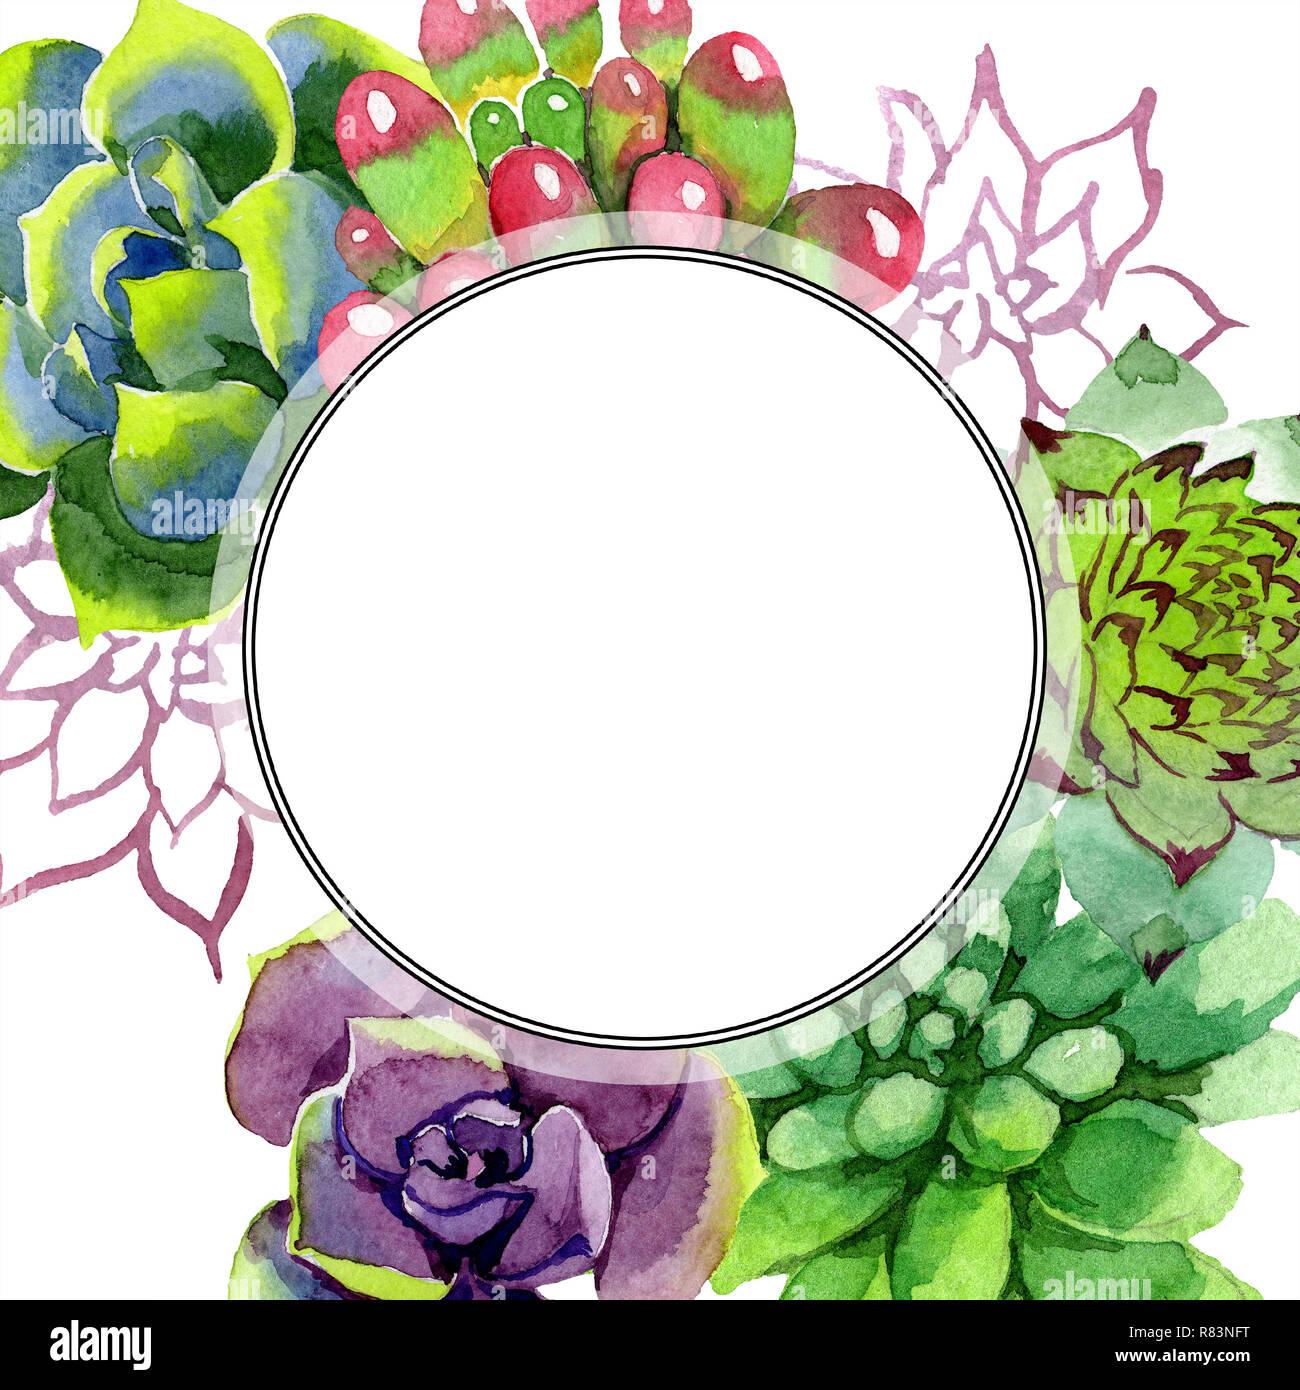 Amazing Succulent Floral Botanical Flower Watercolor Background Illustration Set Frame Border Ornament Round Aquarelle Hand Drawing Succulent Stock Photo Alamy